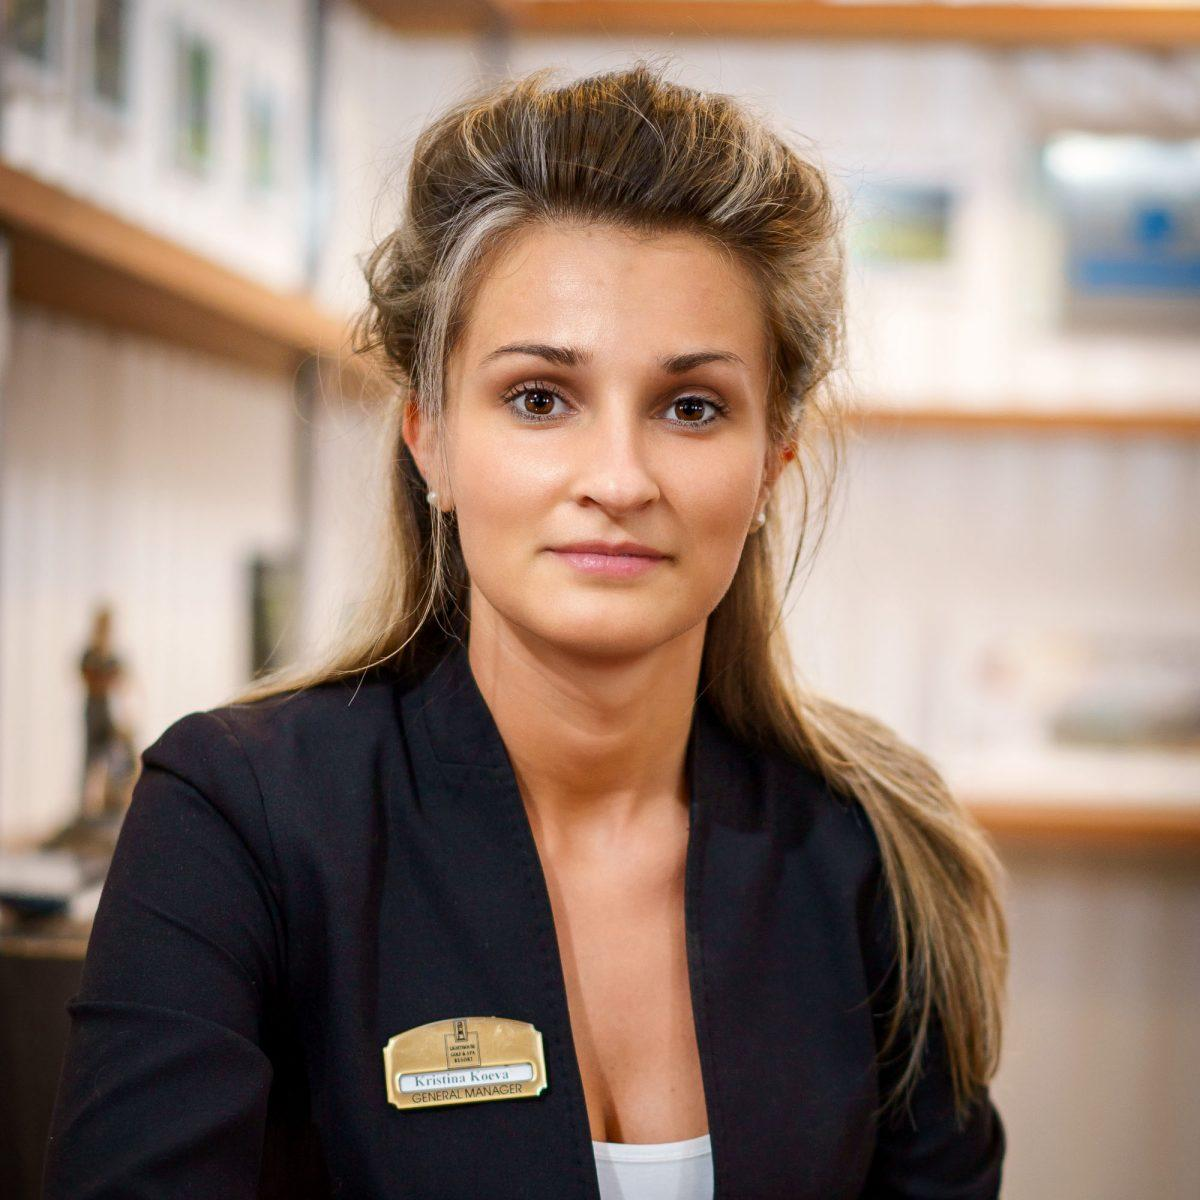 Kristina-Koeva-CEO-Kaliakra-Golf-Foundation